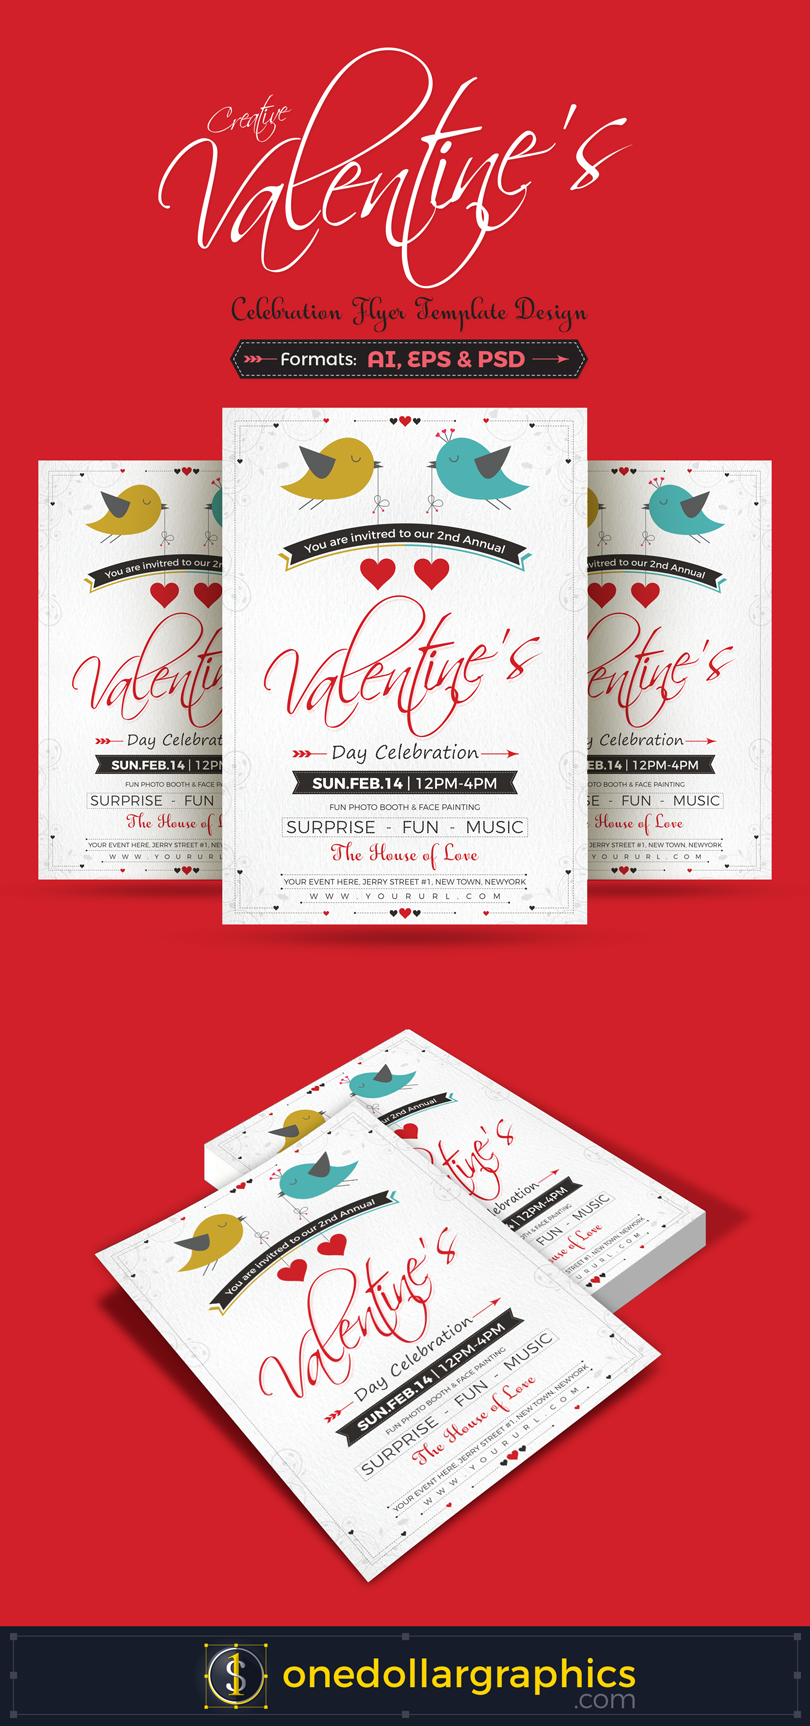 Creative-Valentine-Celebration-Flyer-Template-Design-Preview